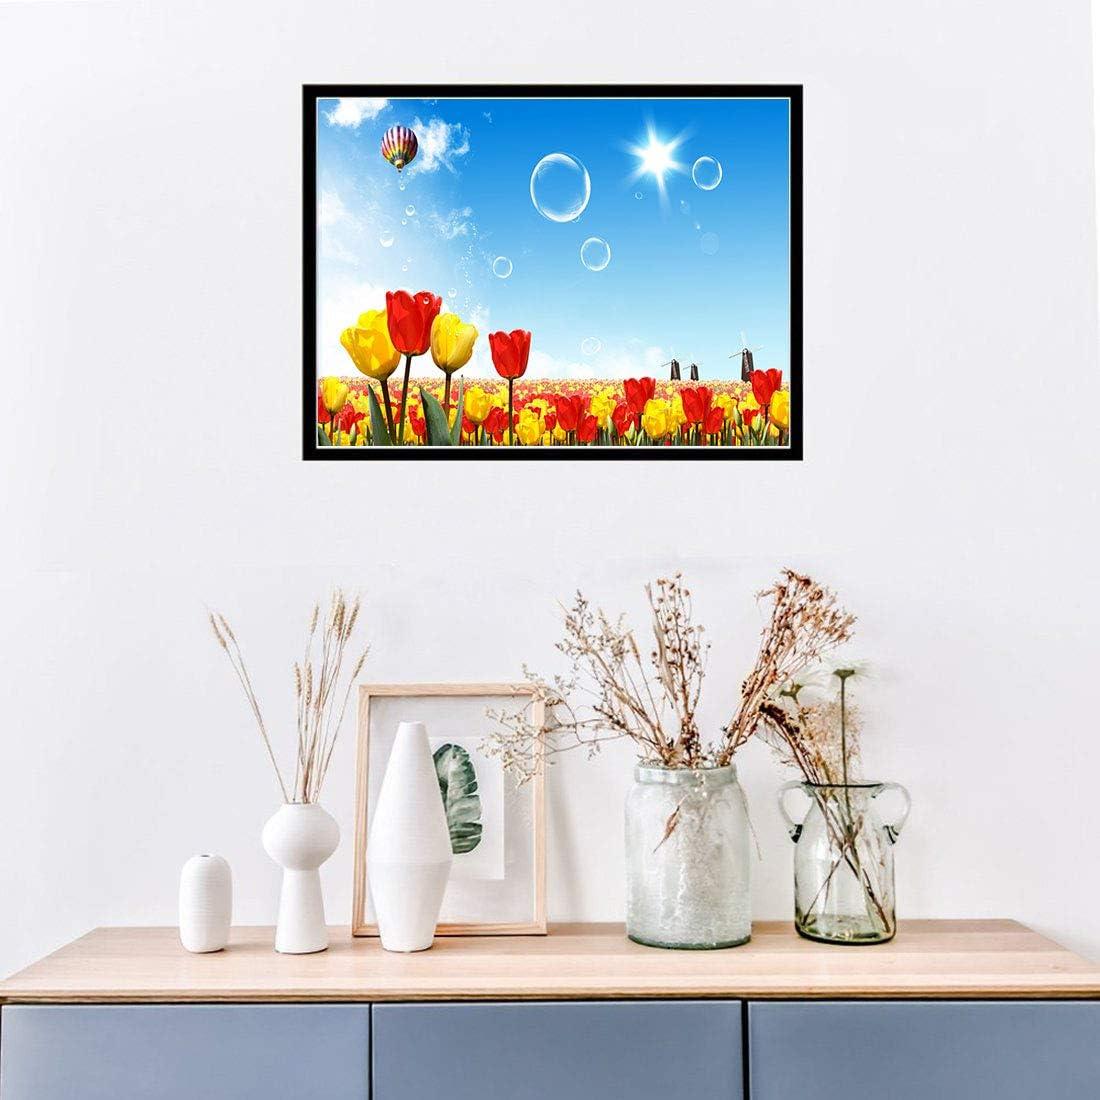 Kit de pintura de diamantes 5D para bricolaje,diy 5d diamond painting rhinestone dise/ño de tulipanes con diamantes de imitaci/ón,cuadros punto de cruz kit 40 x 30 cm